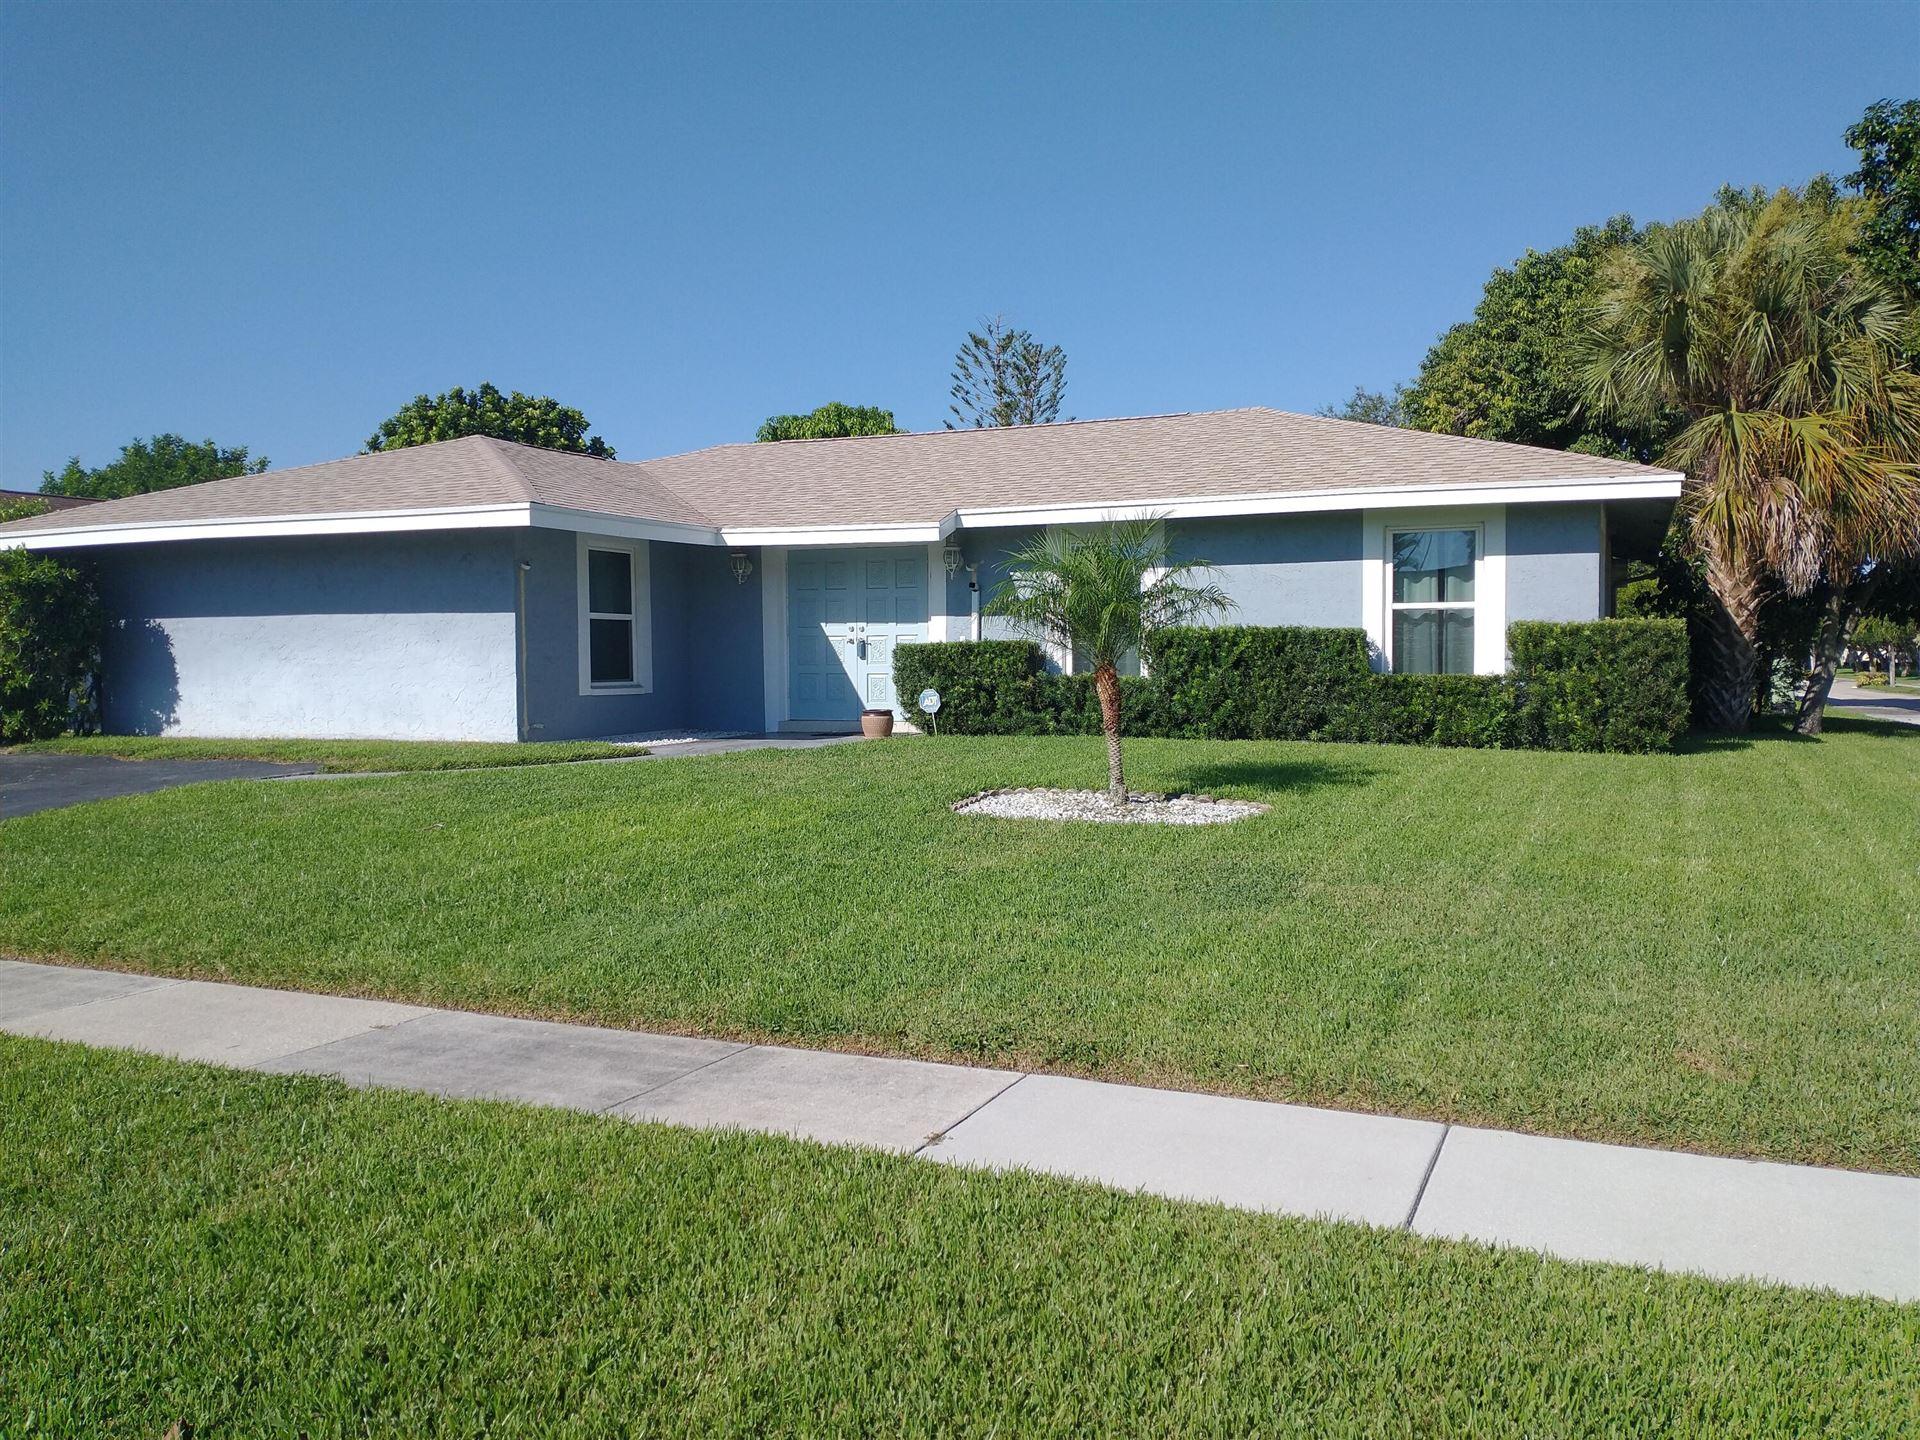 Photo of 3805 Match Road, Lake Worth, FL 33467 (MLS # RX-10745469)